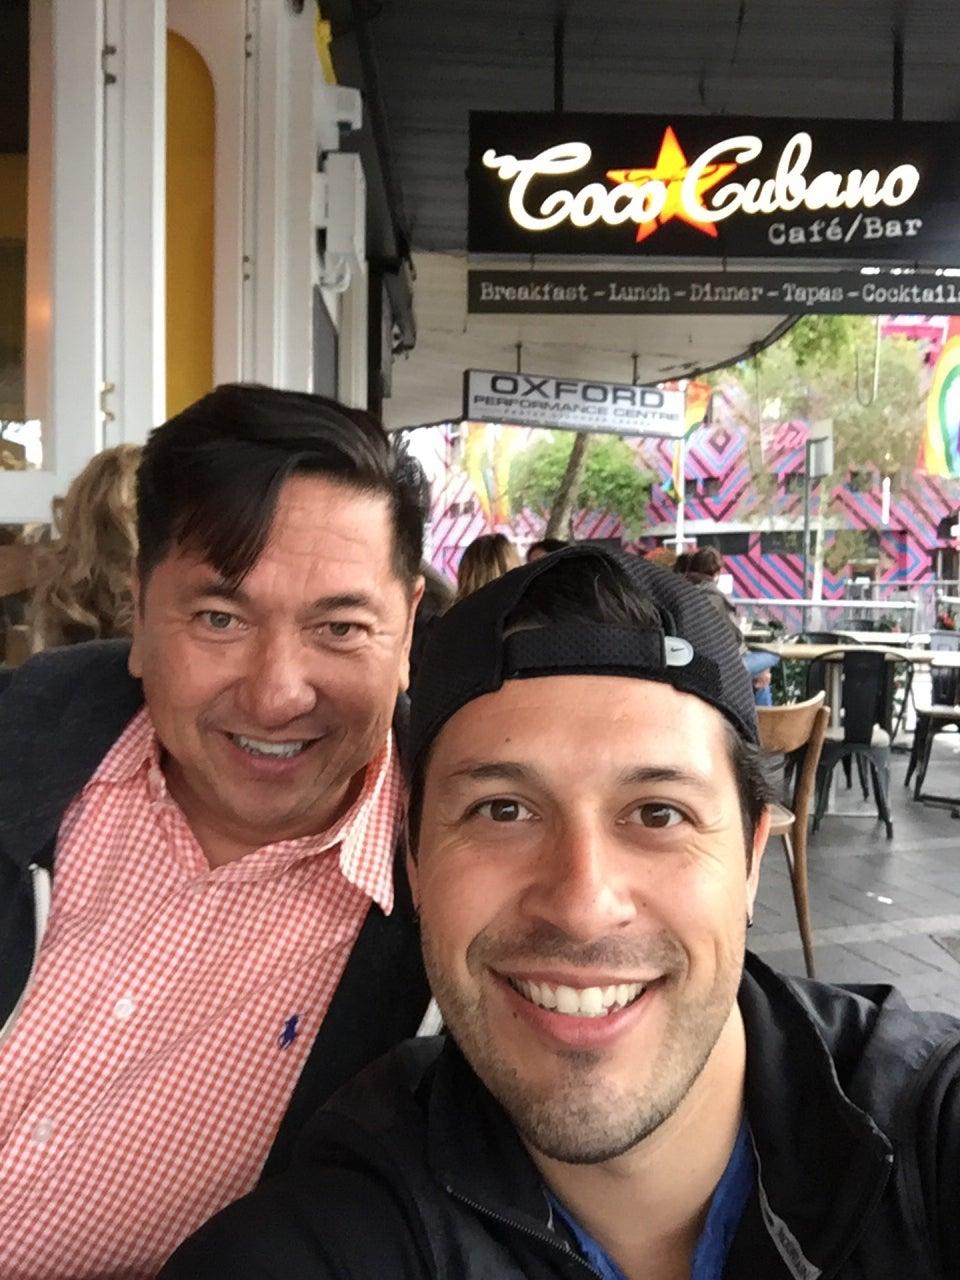 Photo of Coco Cubano